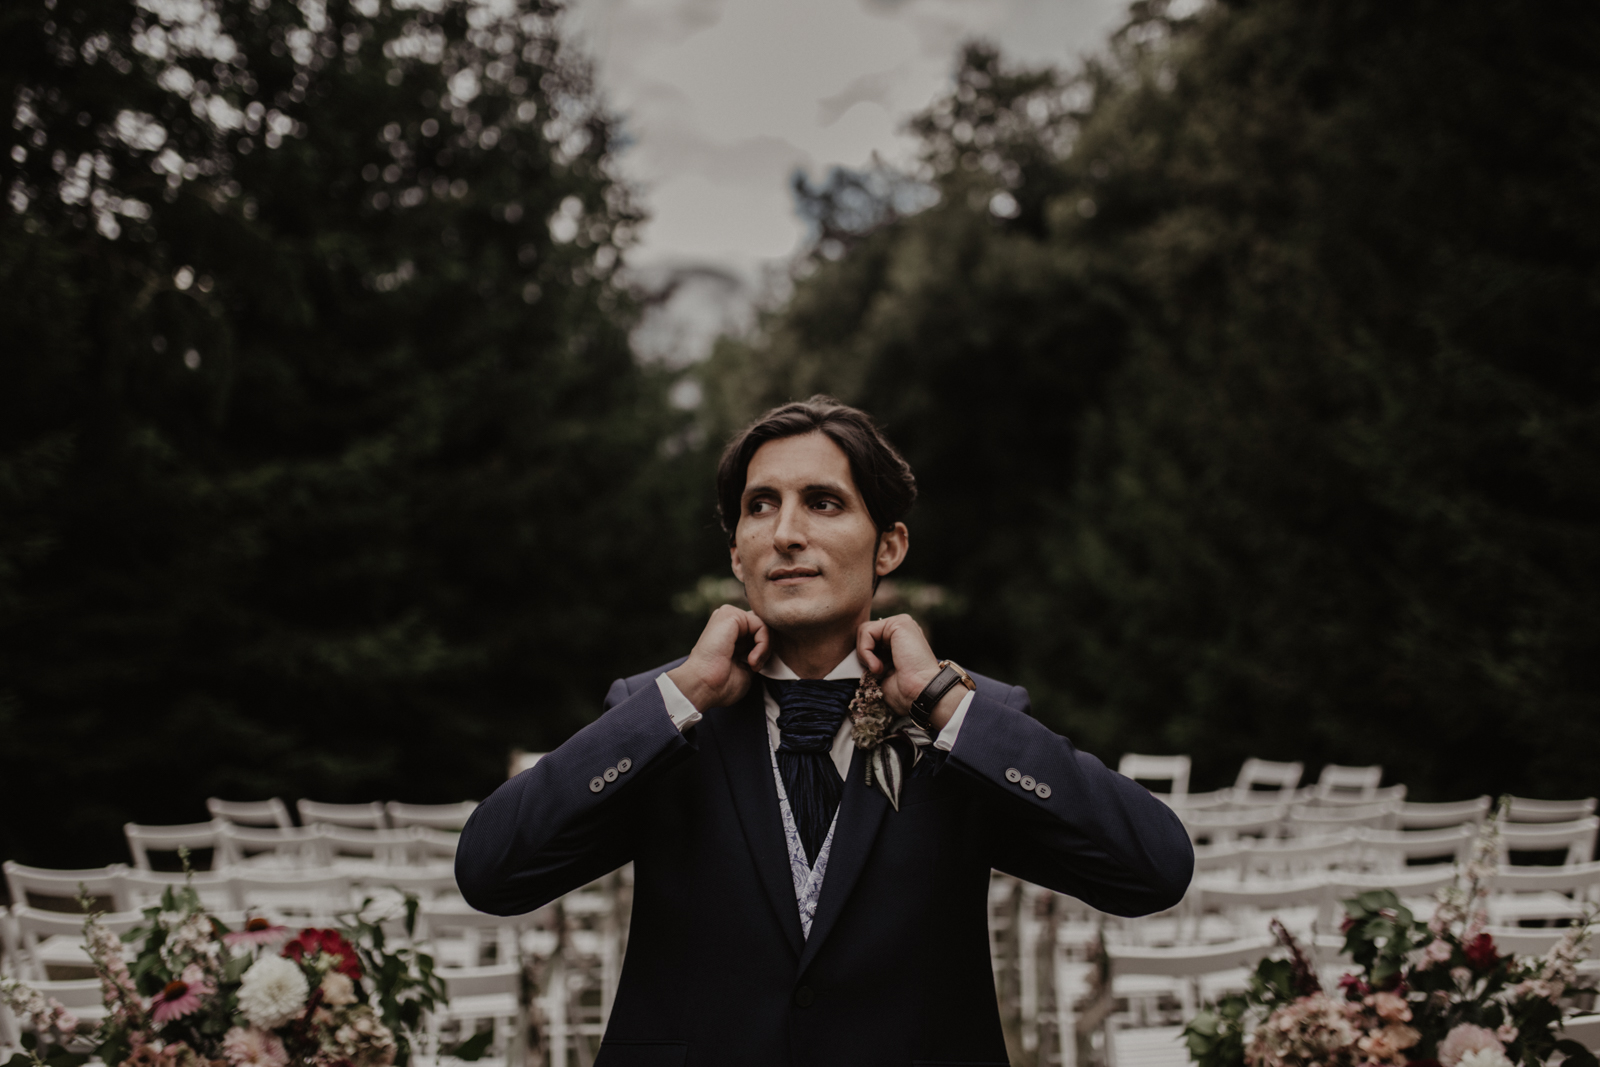 thenortherngirlphotography_photography_thenortherngirl_rebeccascabros_wedding_weddingphotography_weddingphotographer_barcelona_bodaenbarcelona_bodaenmaselmarti_bodarogeryvane-546.jpg